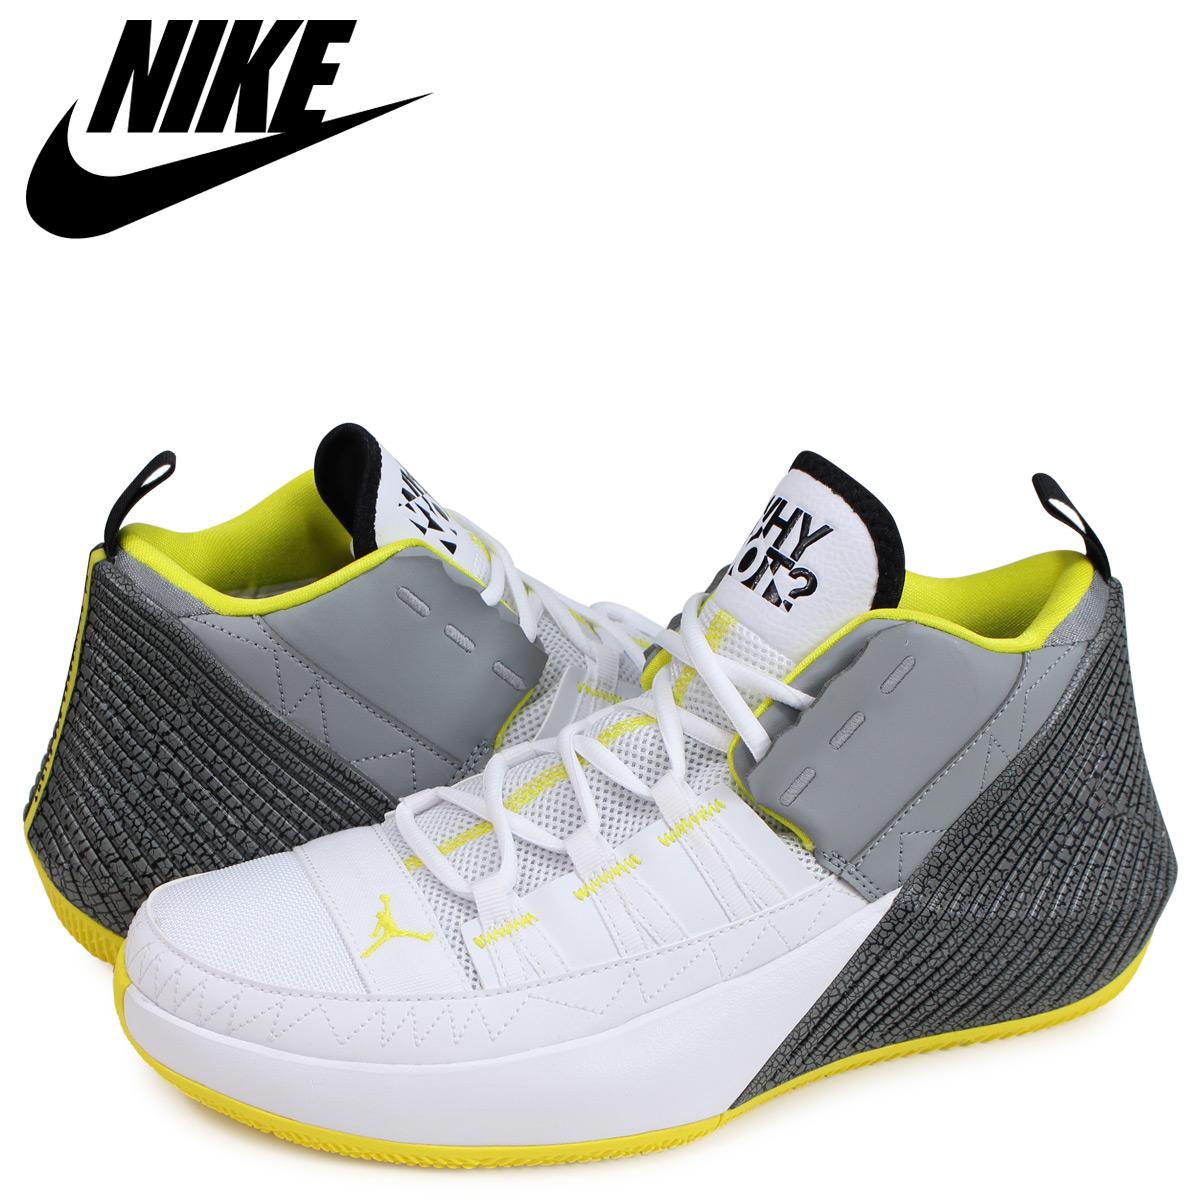 3f0830708d0 NIKE Nike Jordan sneakers men JORDAN WHY NOT ZER0.1 CHAOS PF white BV5499- 100